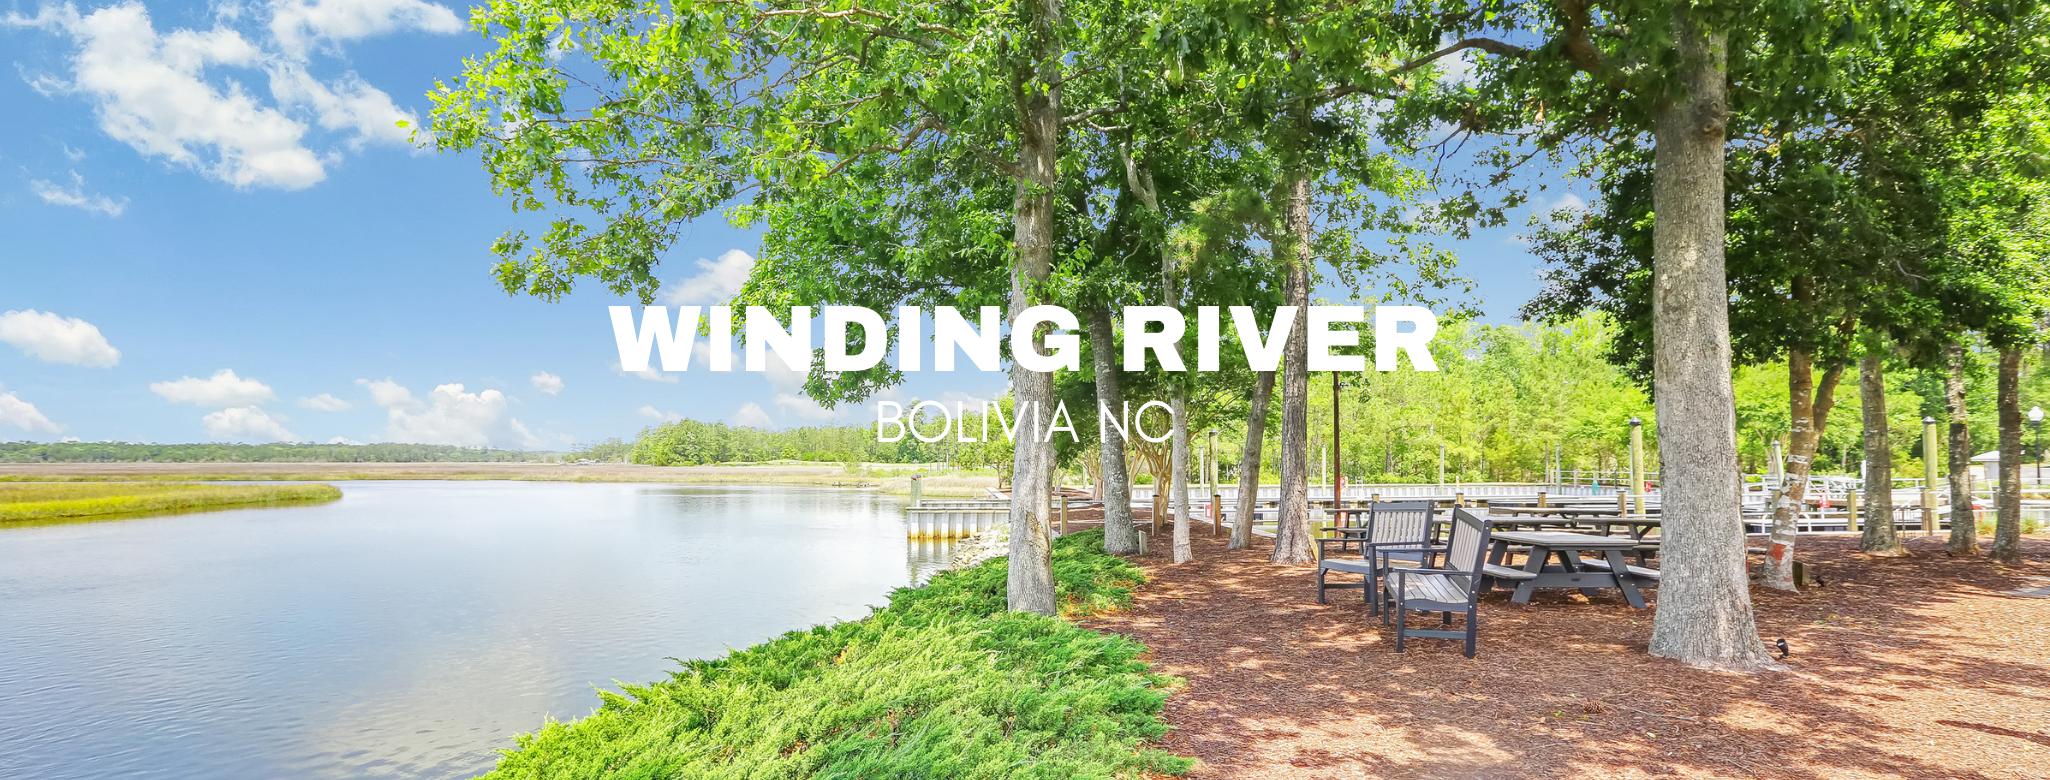 Winding River • Bolivia NC